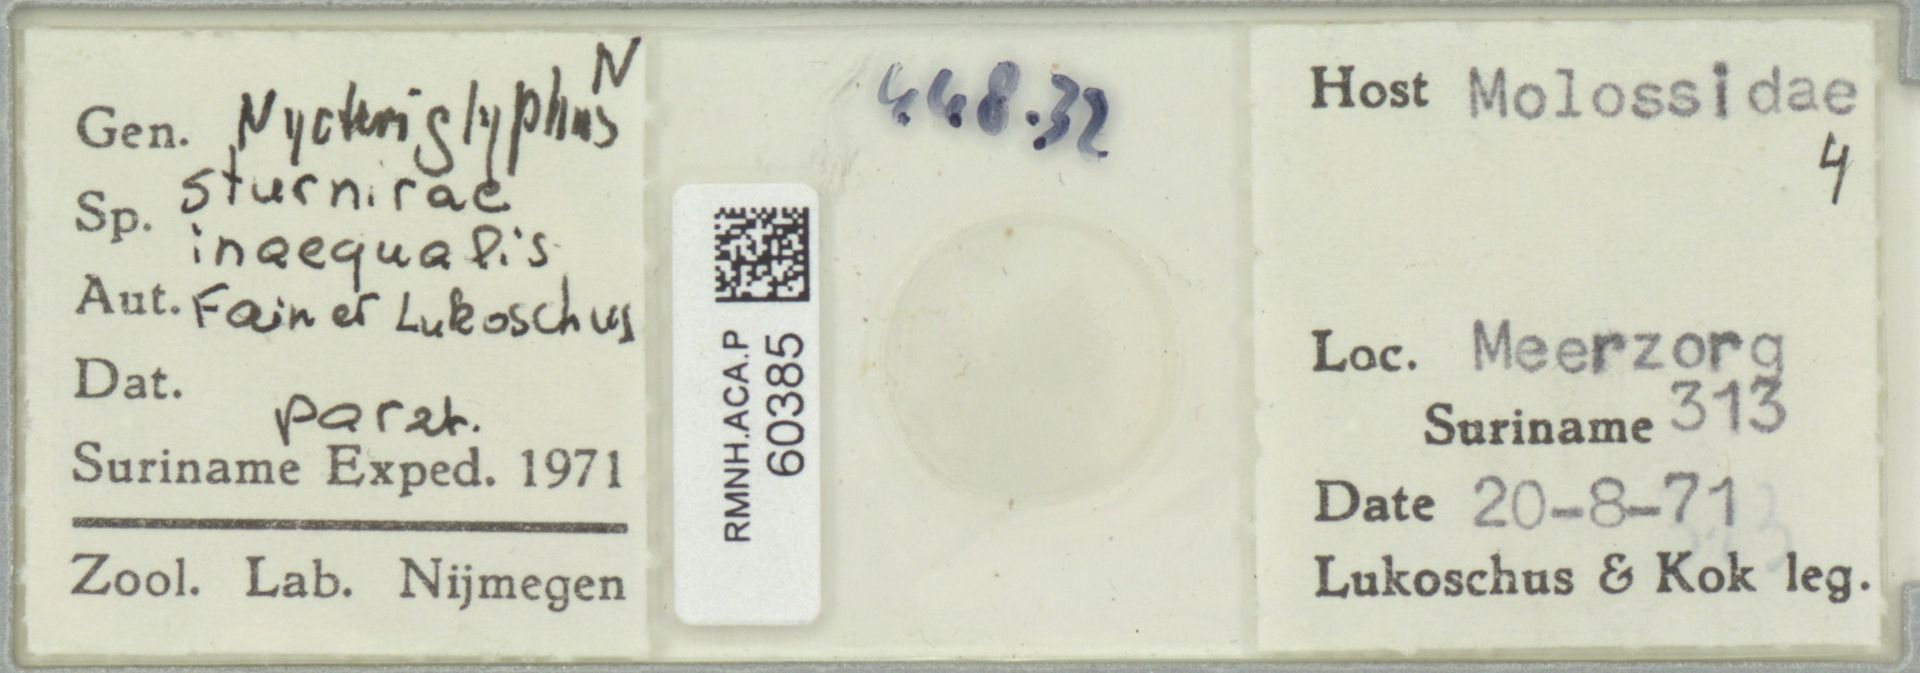 RMNH.ACA.P.60385 | Nycteriglyphus sturnirae inaequalis Fain et Lukoschus